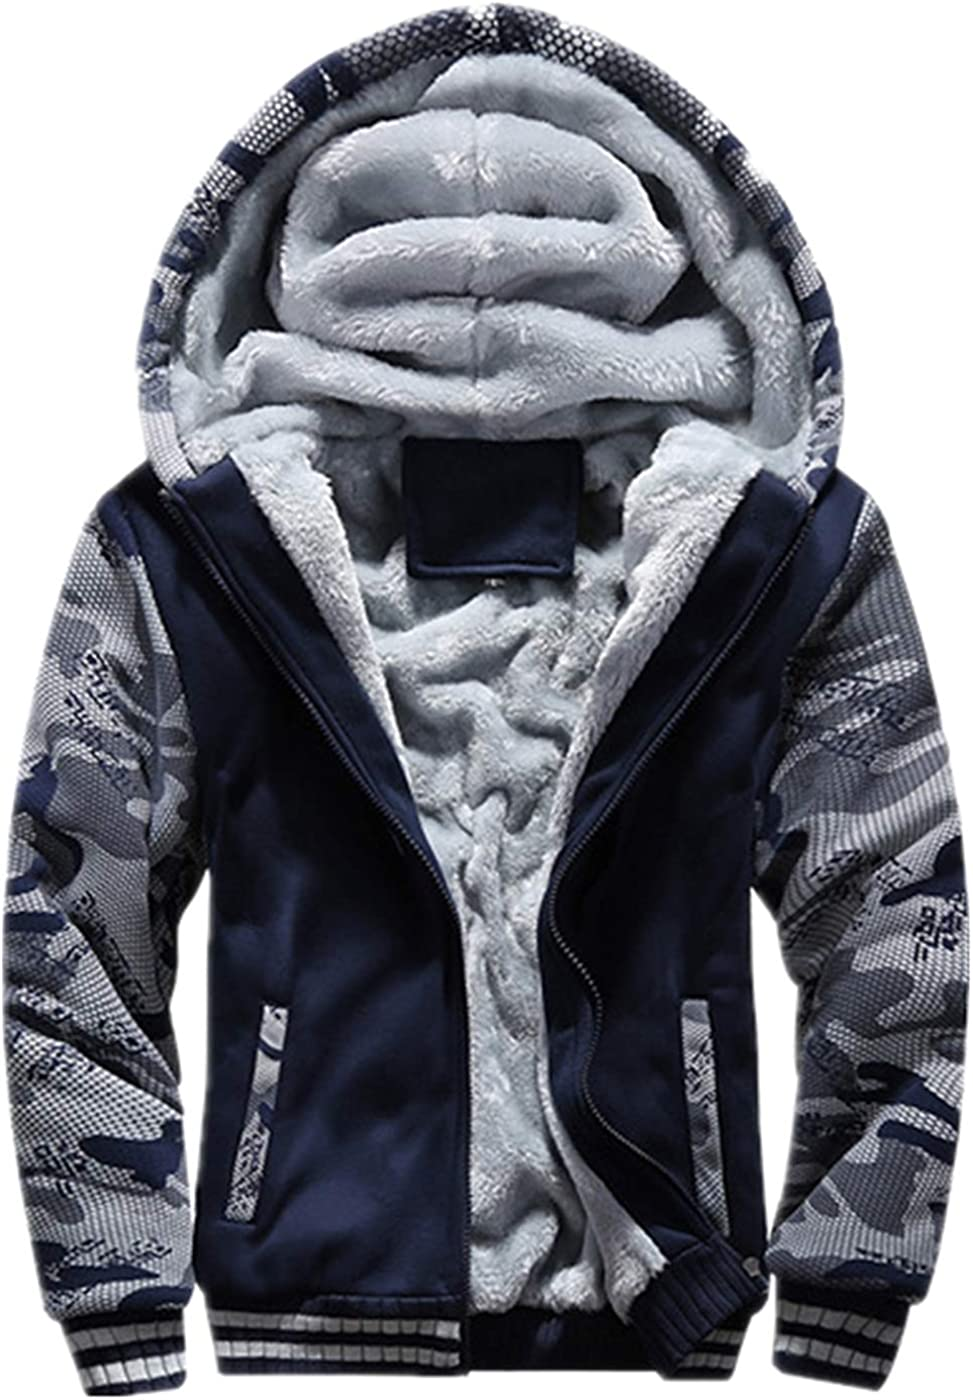 JiangWu Hoodies for Men Winter Cheap super special price Sherpa Z Purchase Fleece Heavyweight Lined